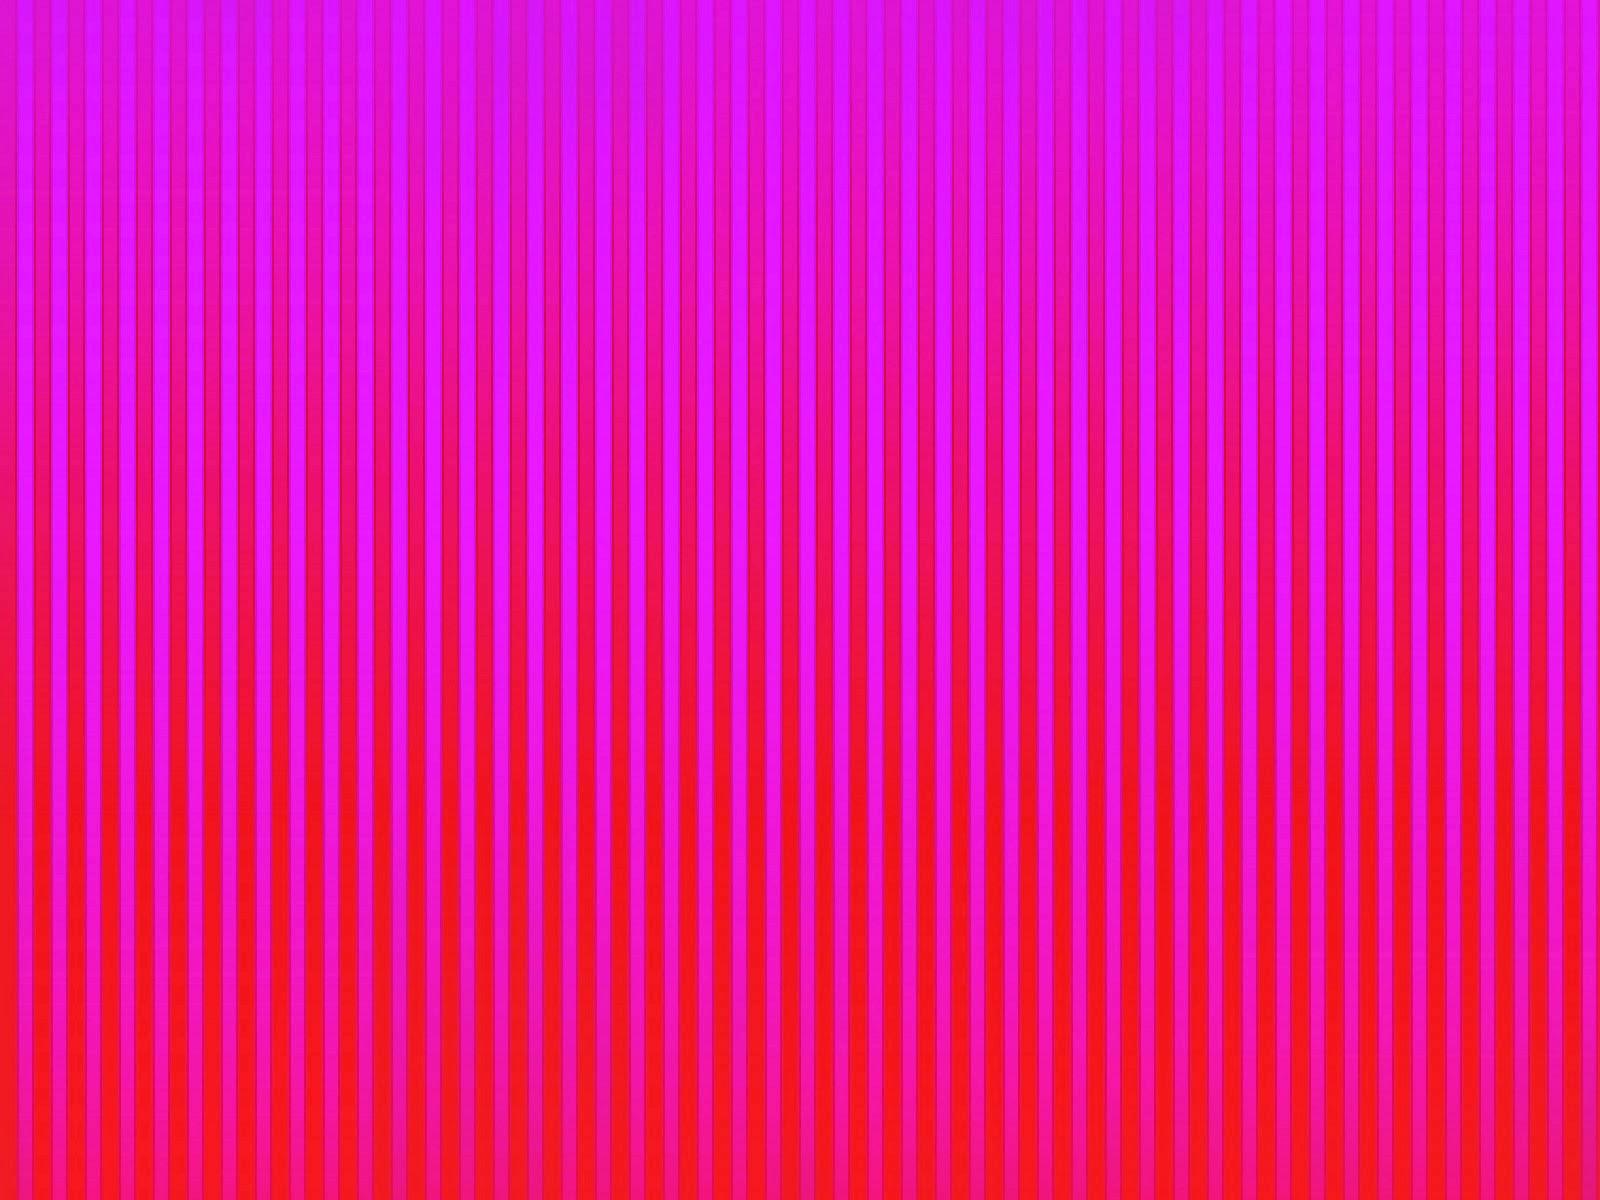 Pink pattern stripes - photo#16